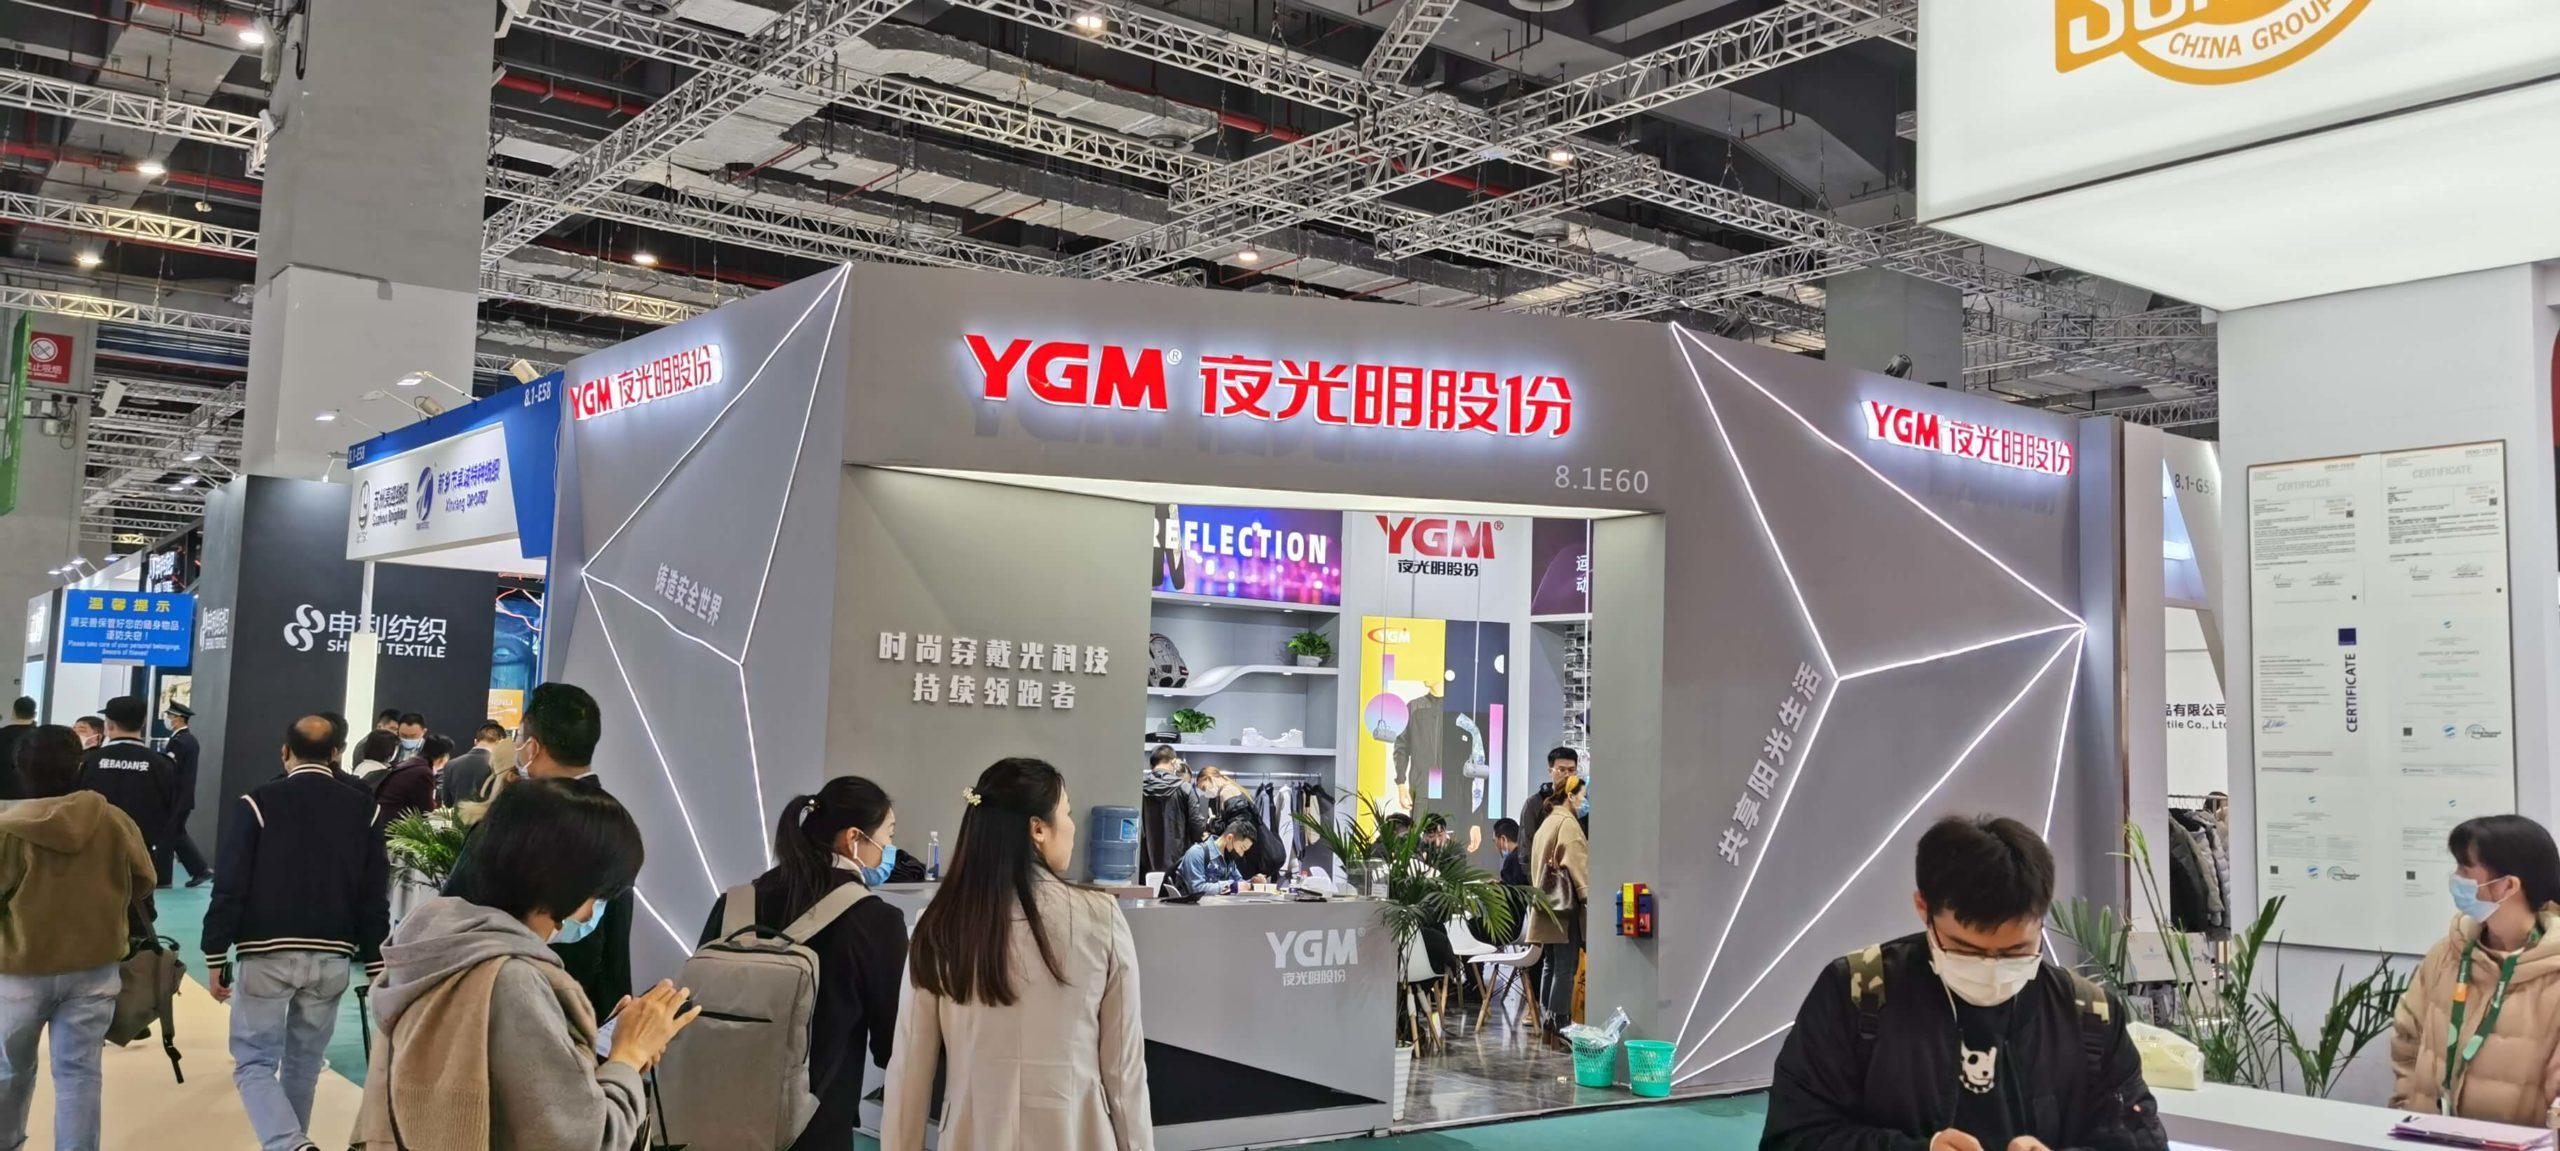 YGM reflective on intertextile2021 Trade Show (2)